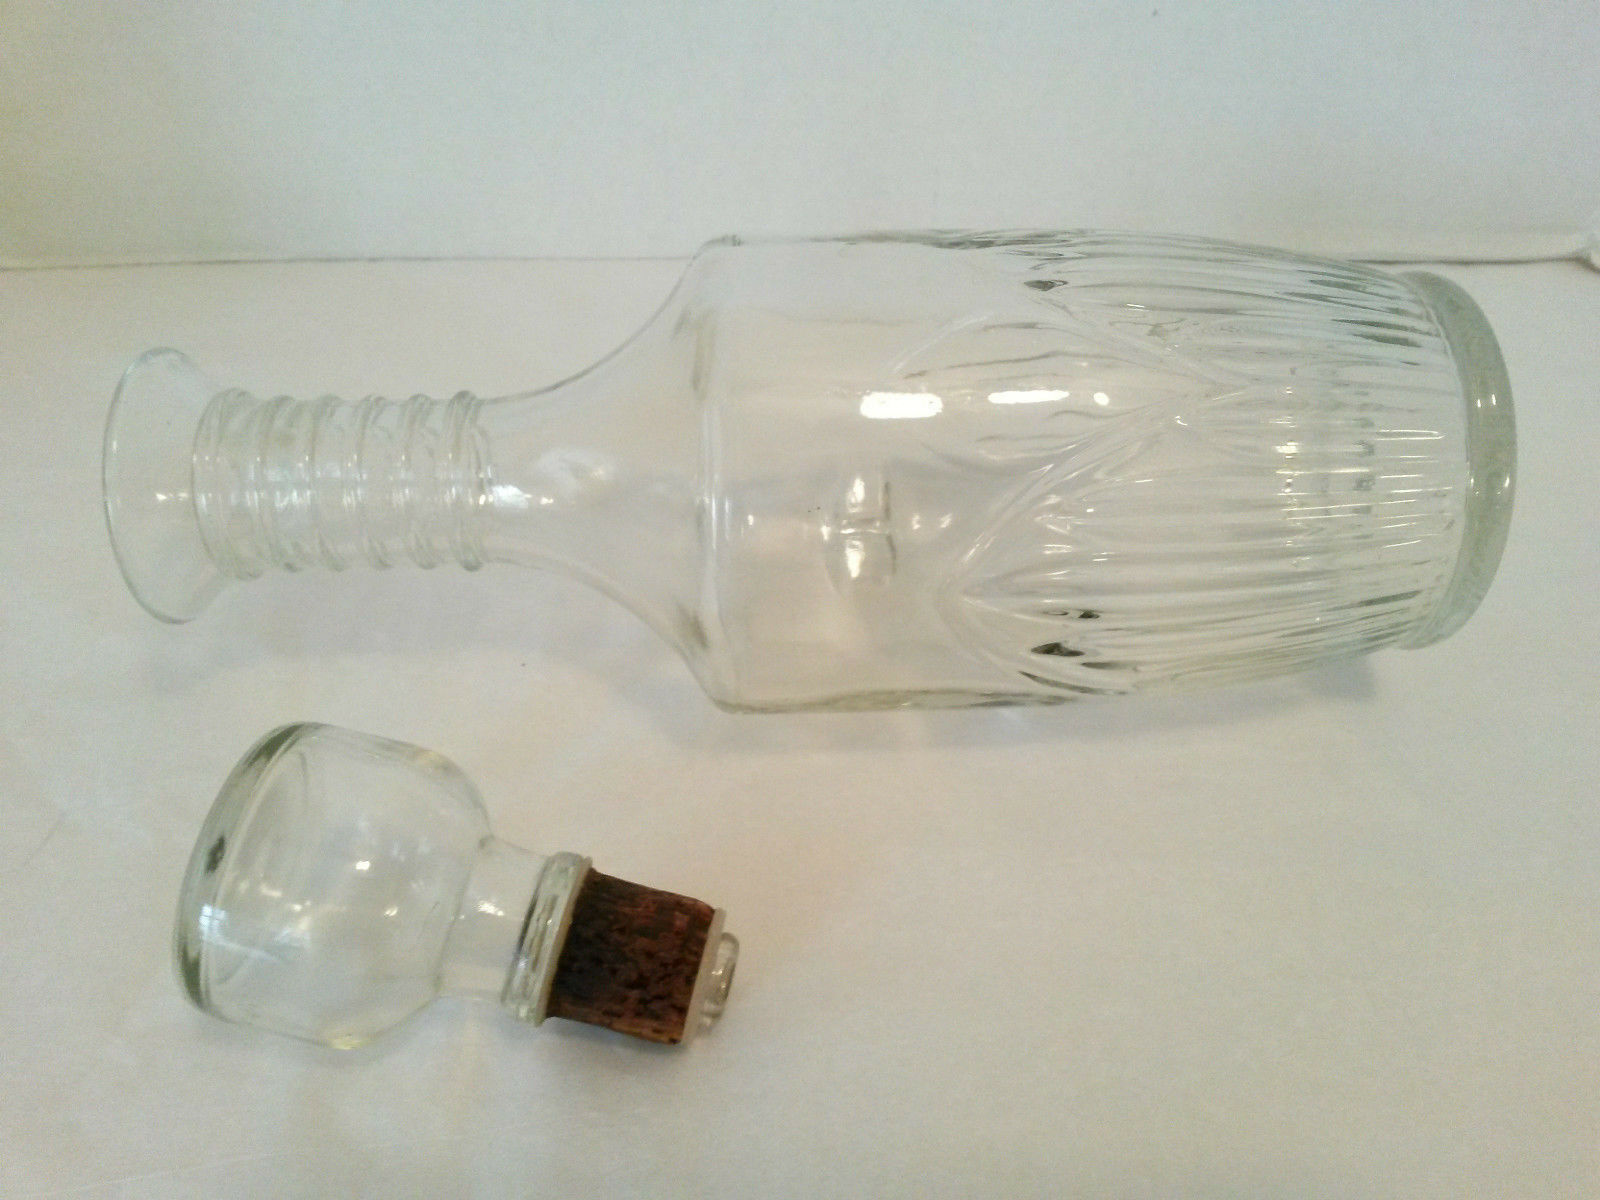 "OWENS ILLINOIS Decanter Vintage 1964 Clear Glass Bottle & Stopper 11 1/2"""